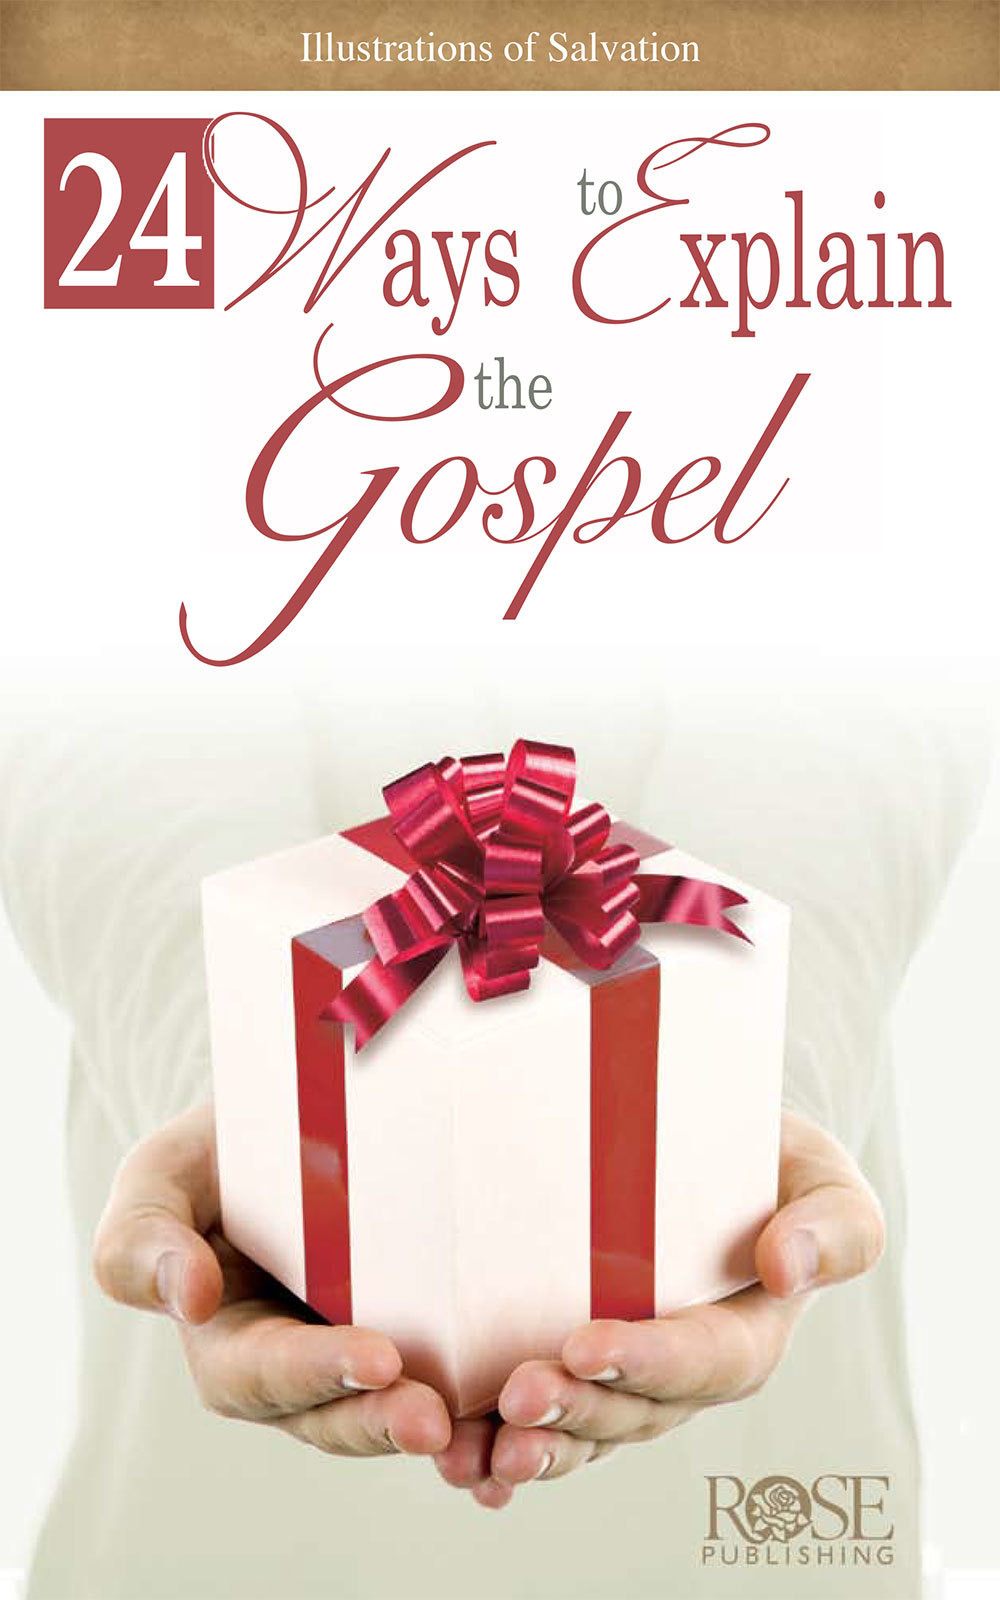 24 Ways to Explain the Gospel